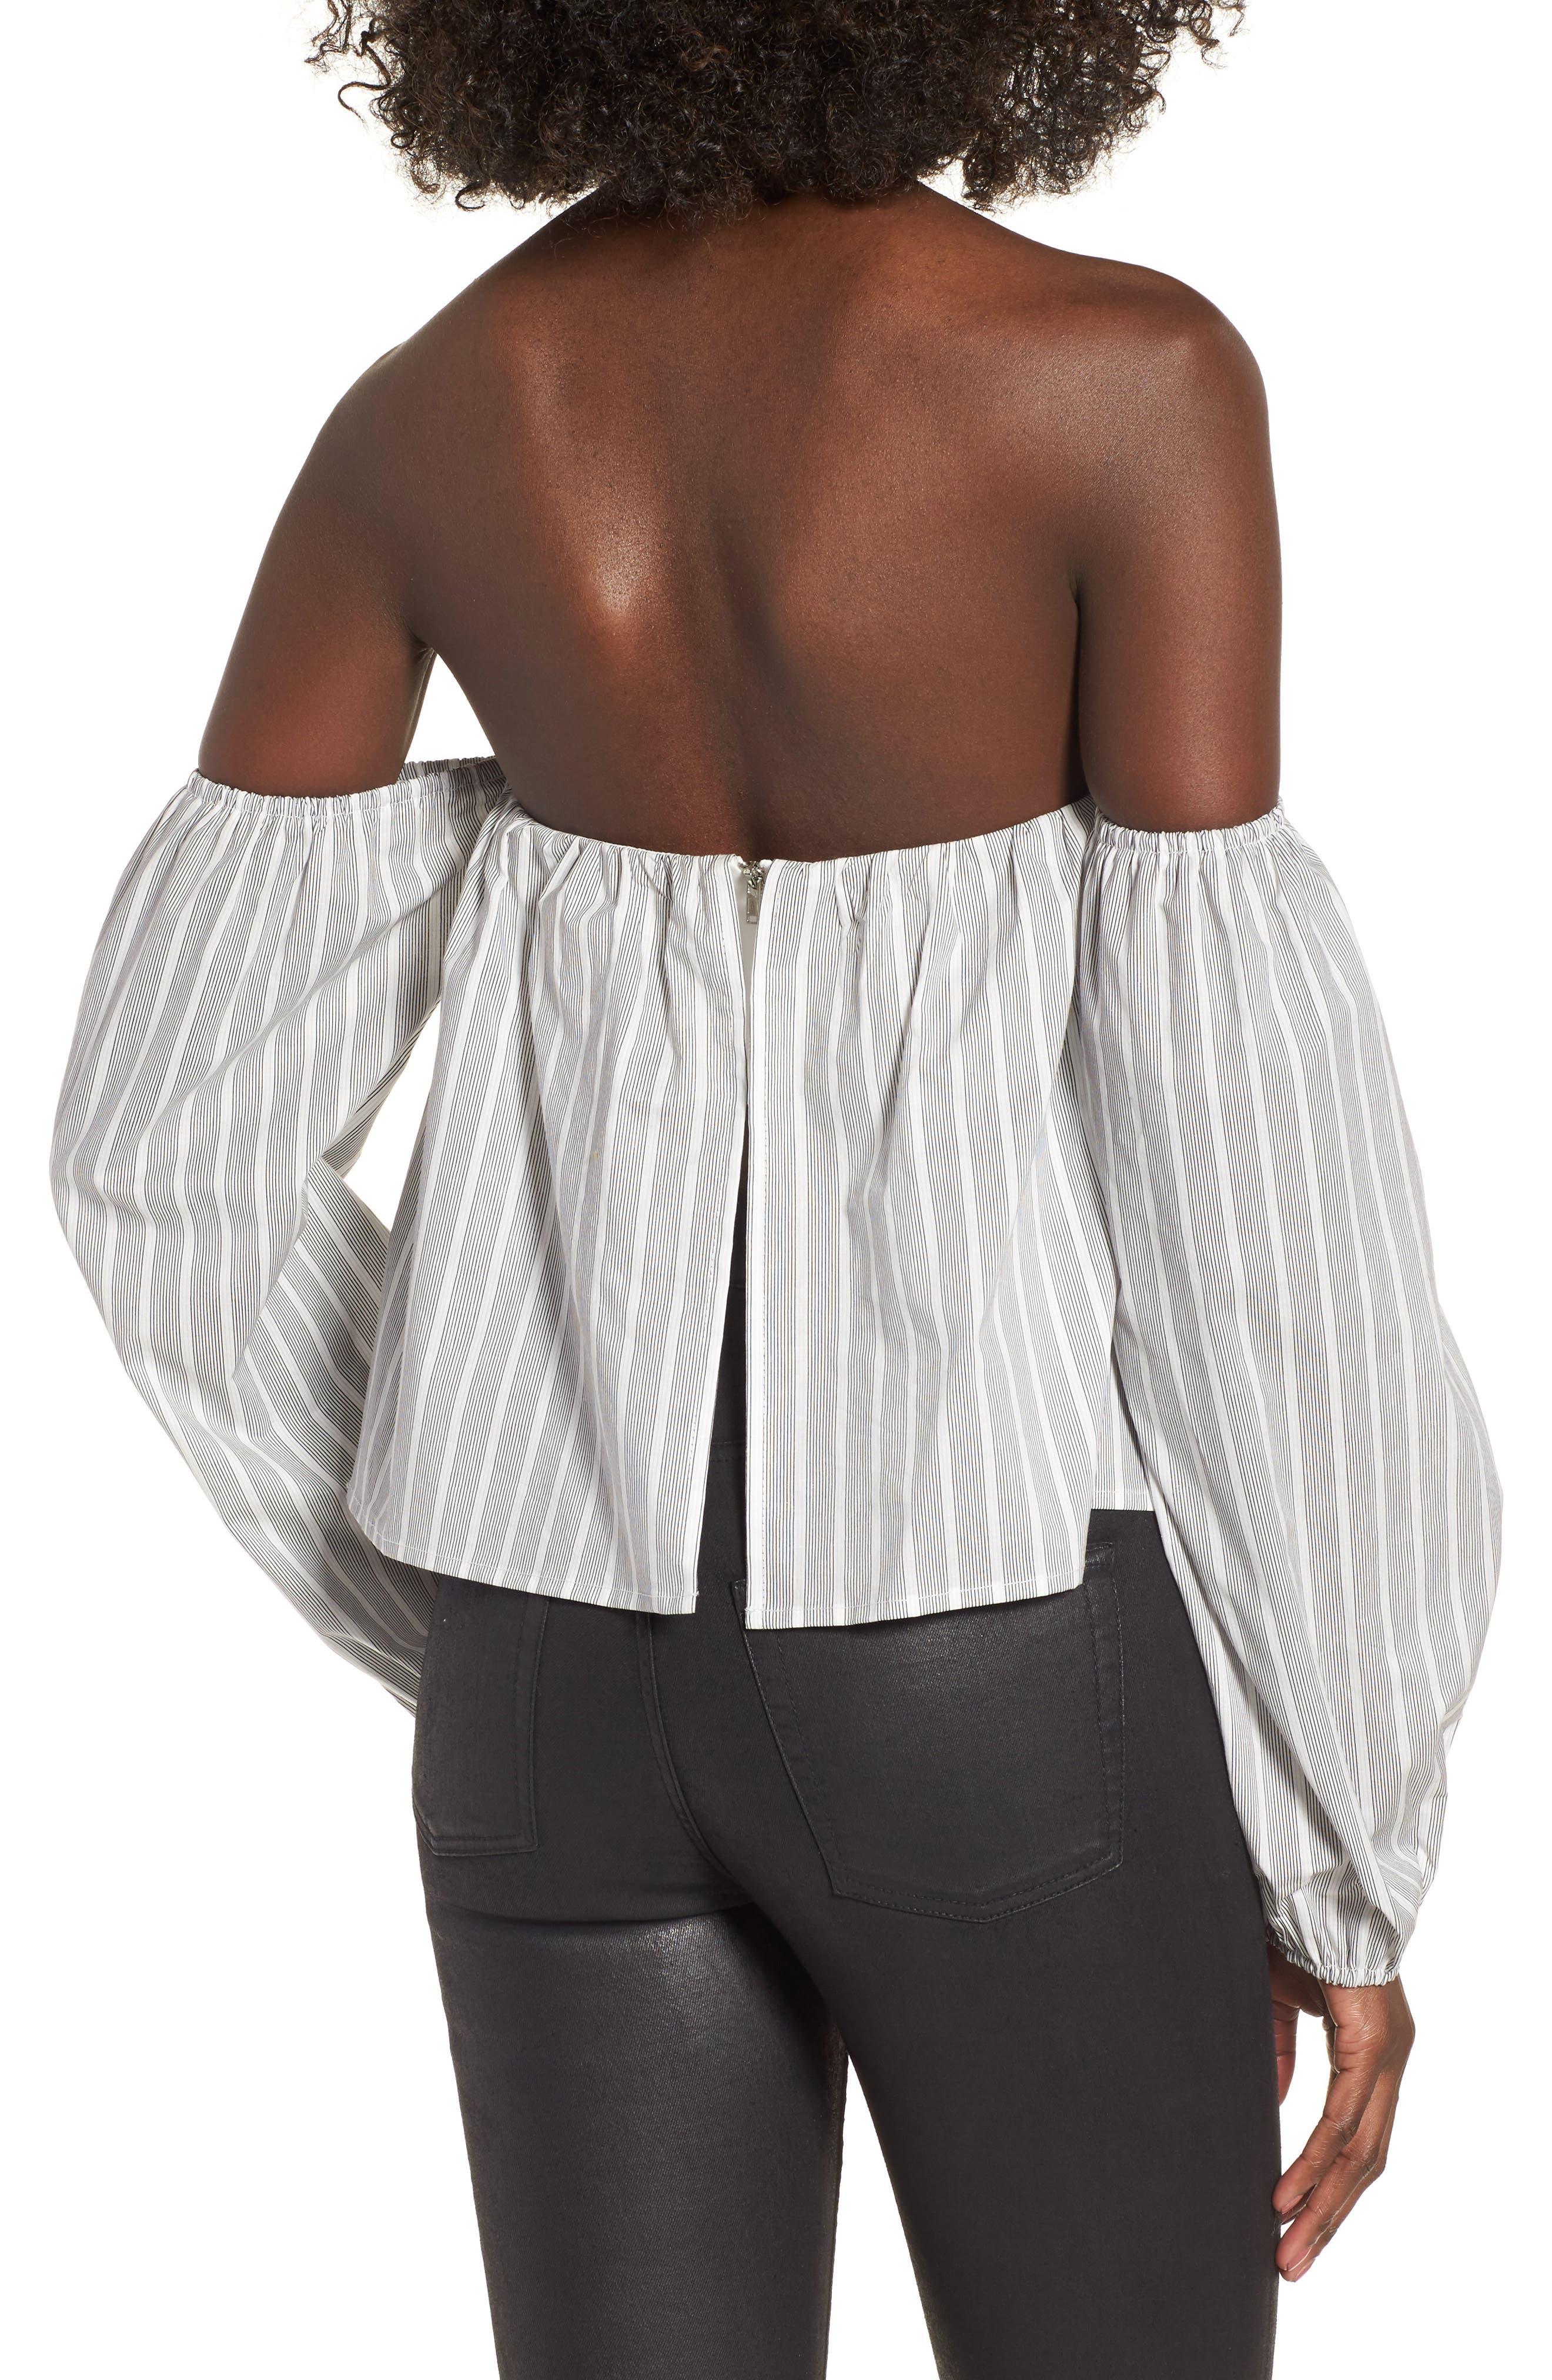 Off the Shoulder Top,                             Alternate thumbnail 2, color,                             Black/ White Stripe